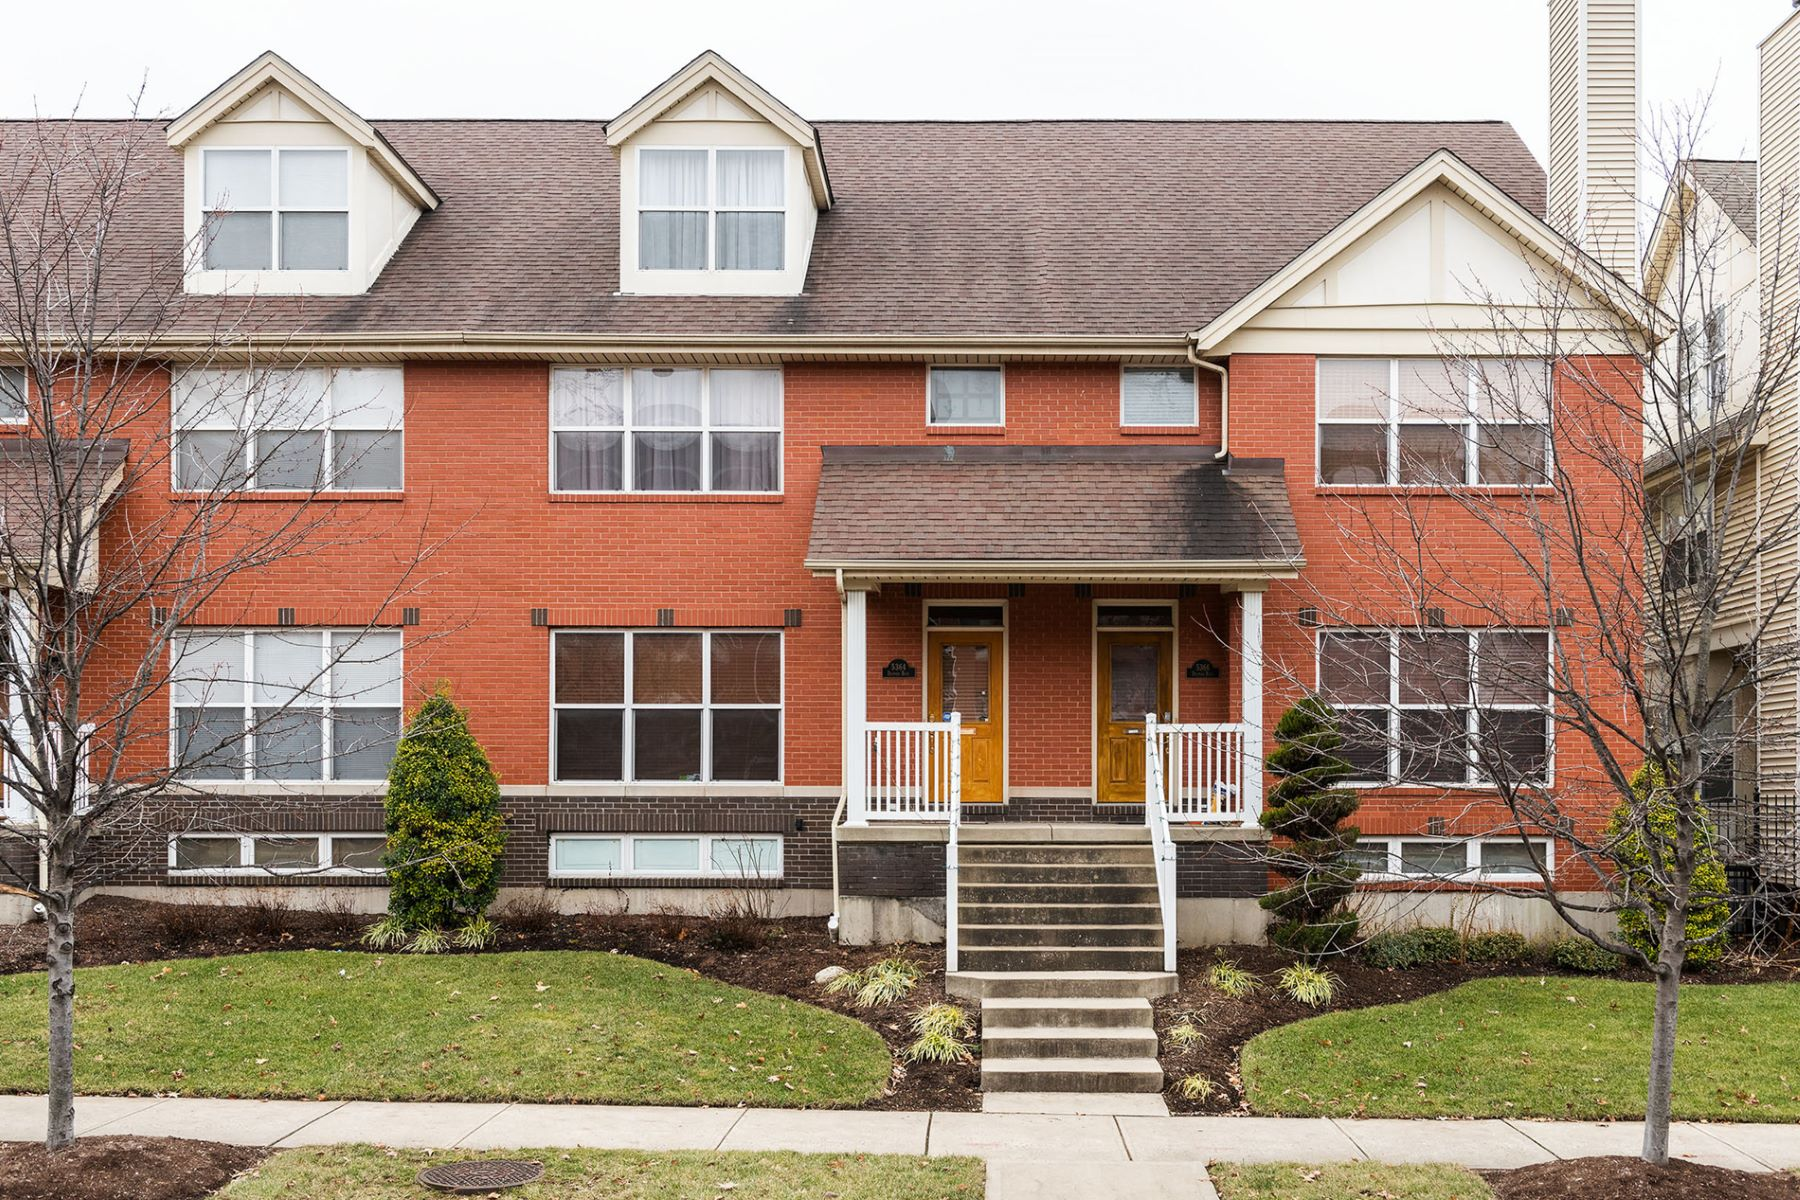 Property for Sale at Delmar Blvd 5364 Delmar Blvd St. Louis, Missouri 63112 United States